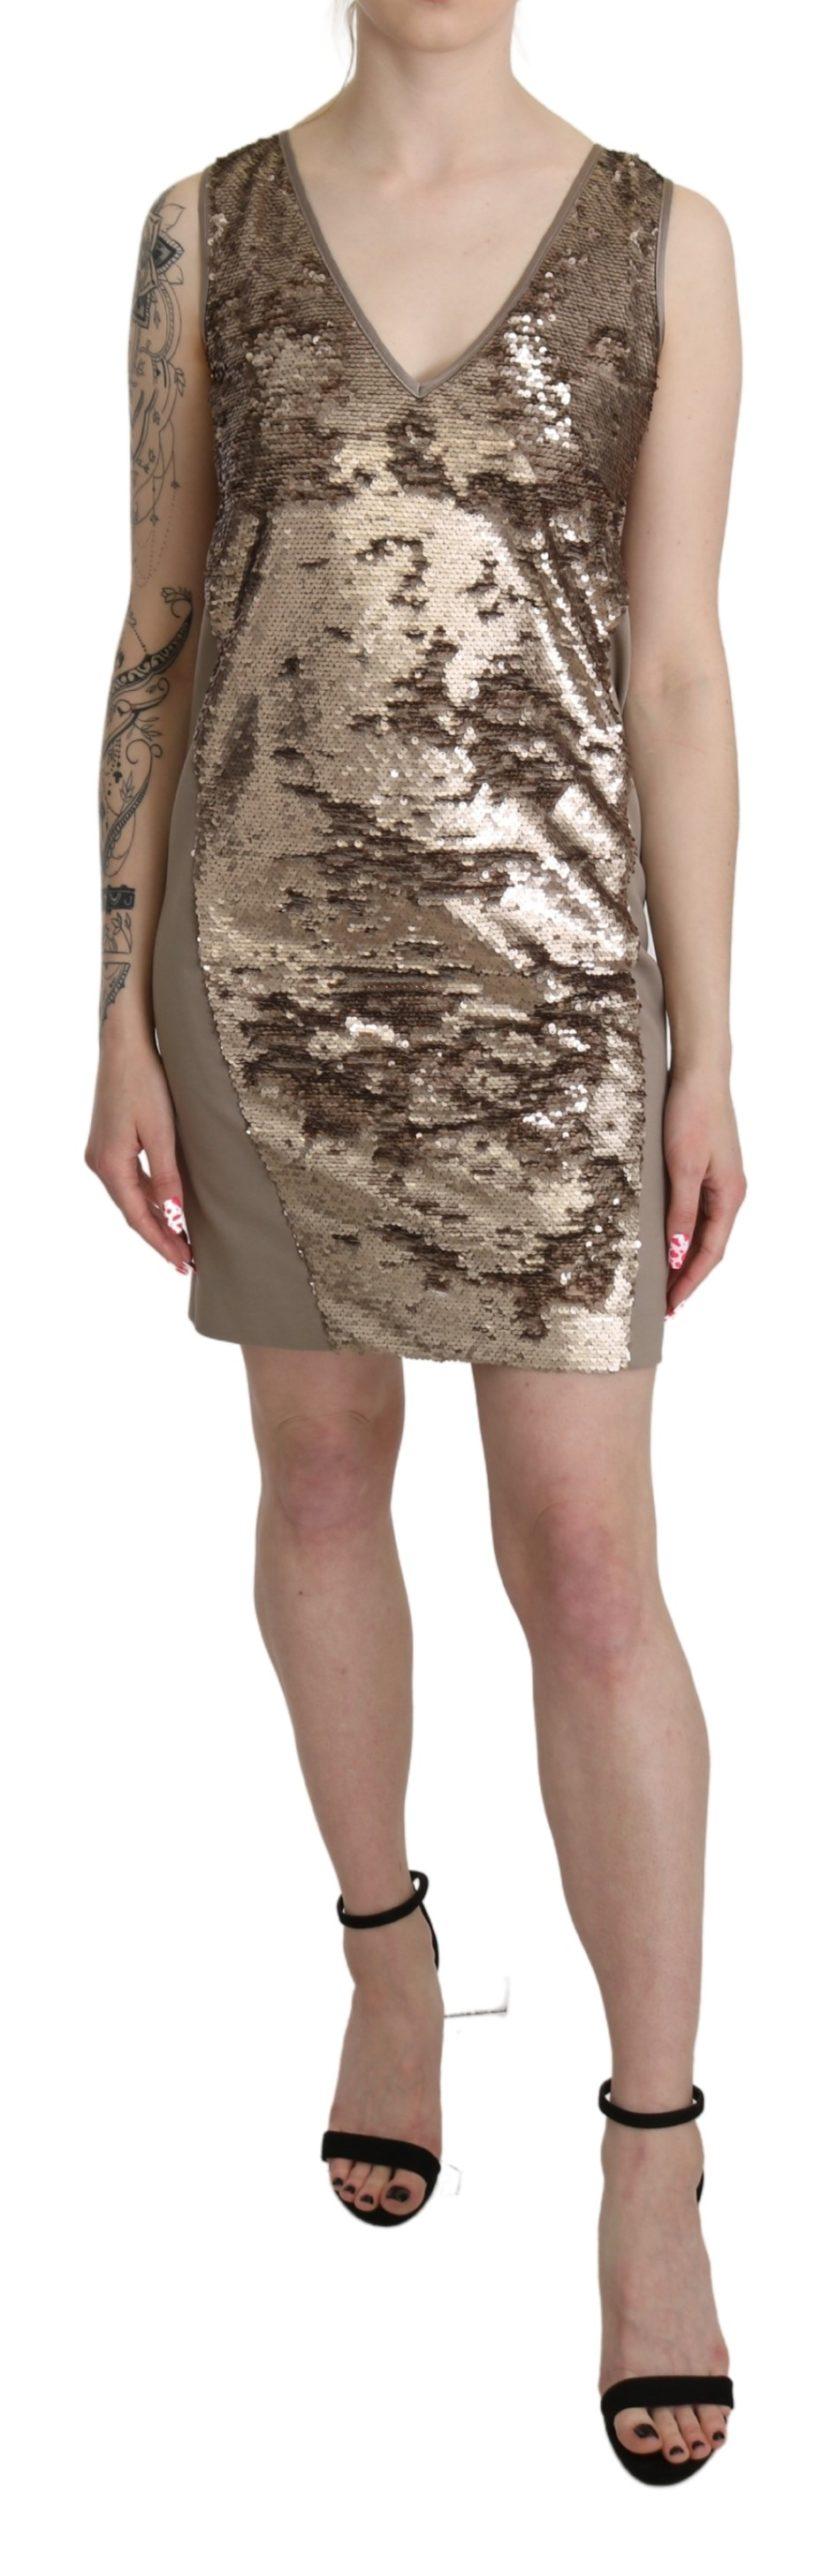 Liu Jo Women's Sequined V-neck Sleeveless Mini Dress Brown DR2615 - IT42|M